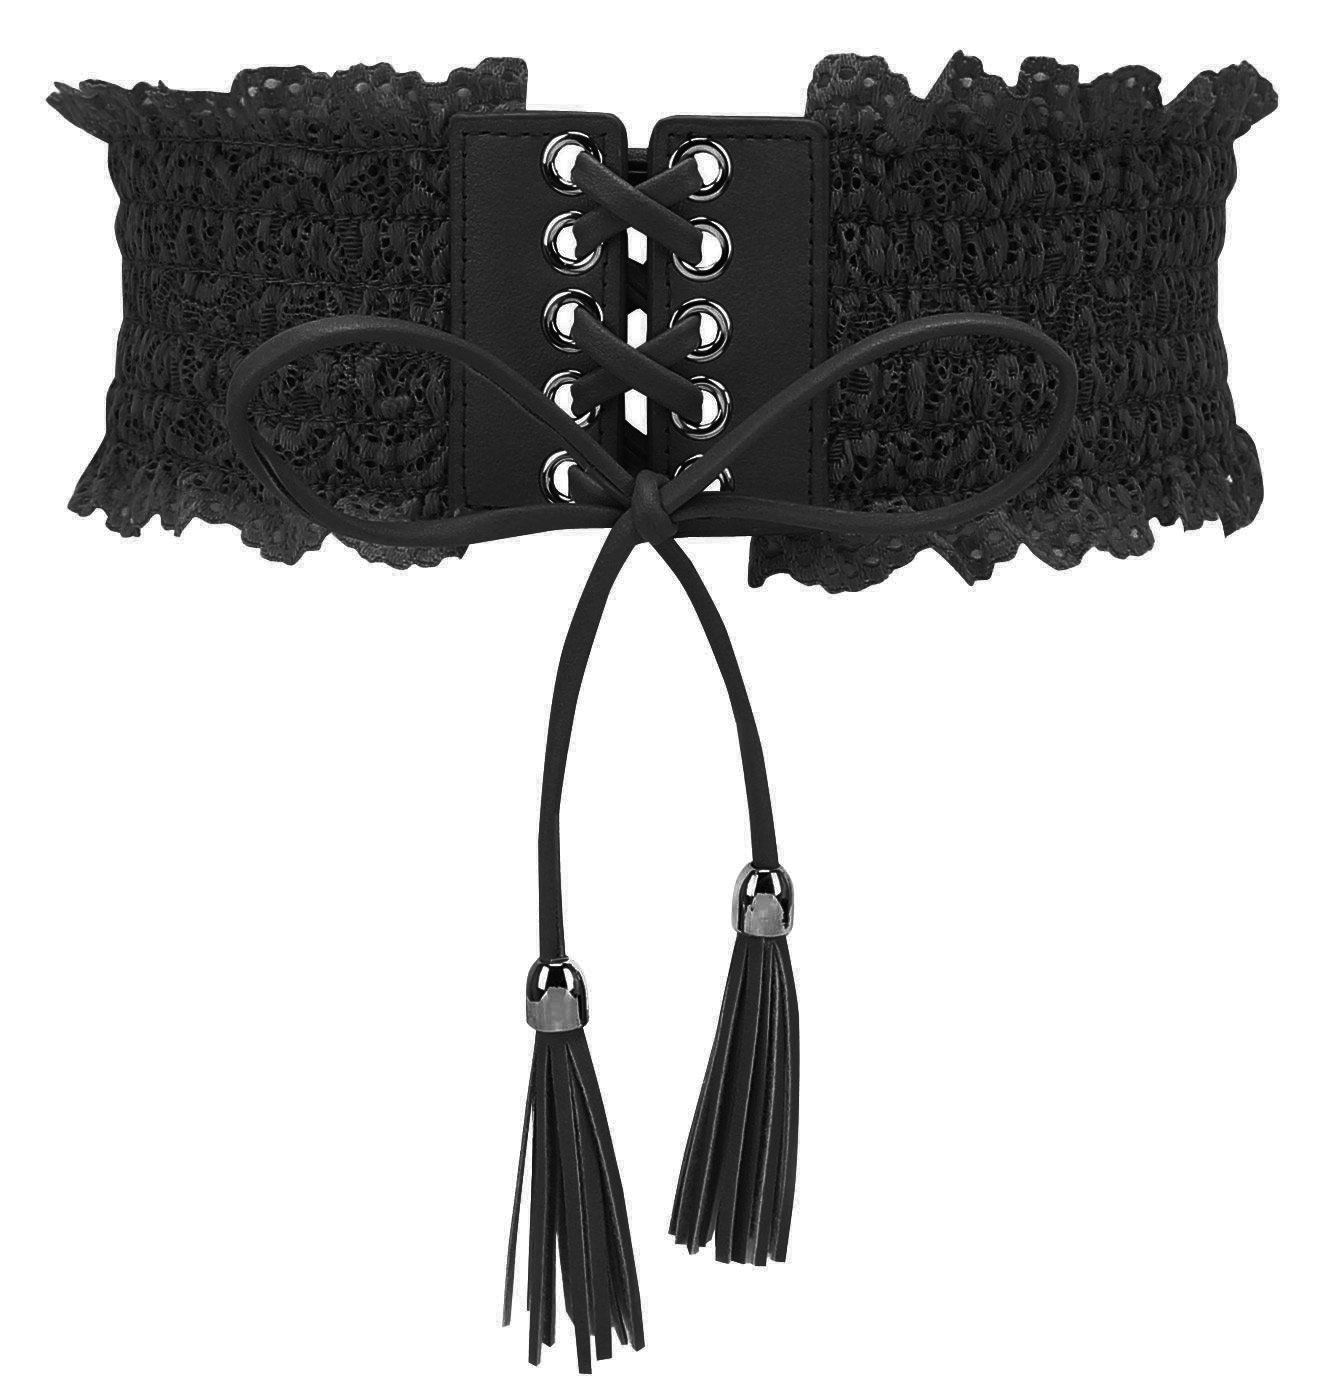 FEOYA Women's Lace Wrap Around Waist Band Bow Tie Plus Size Cincher Boho Obi Sash Belt for Dresses/Shirts, Black, M